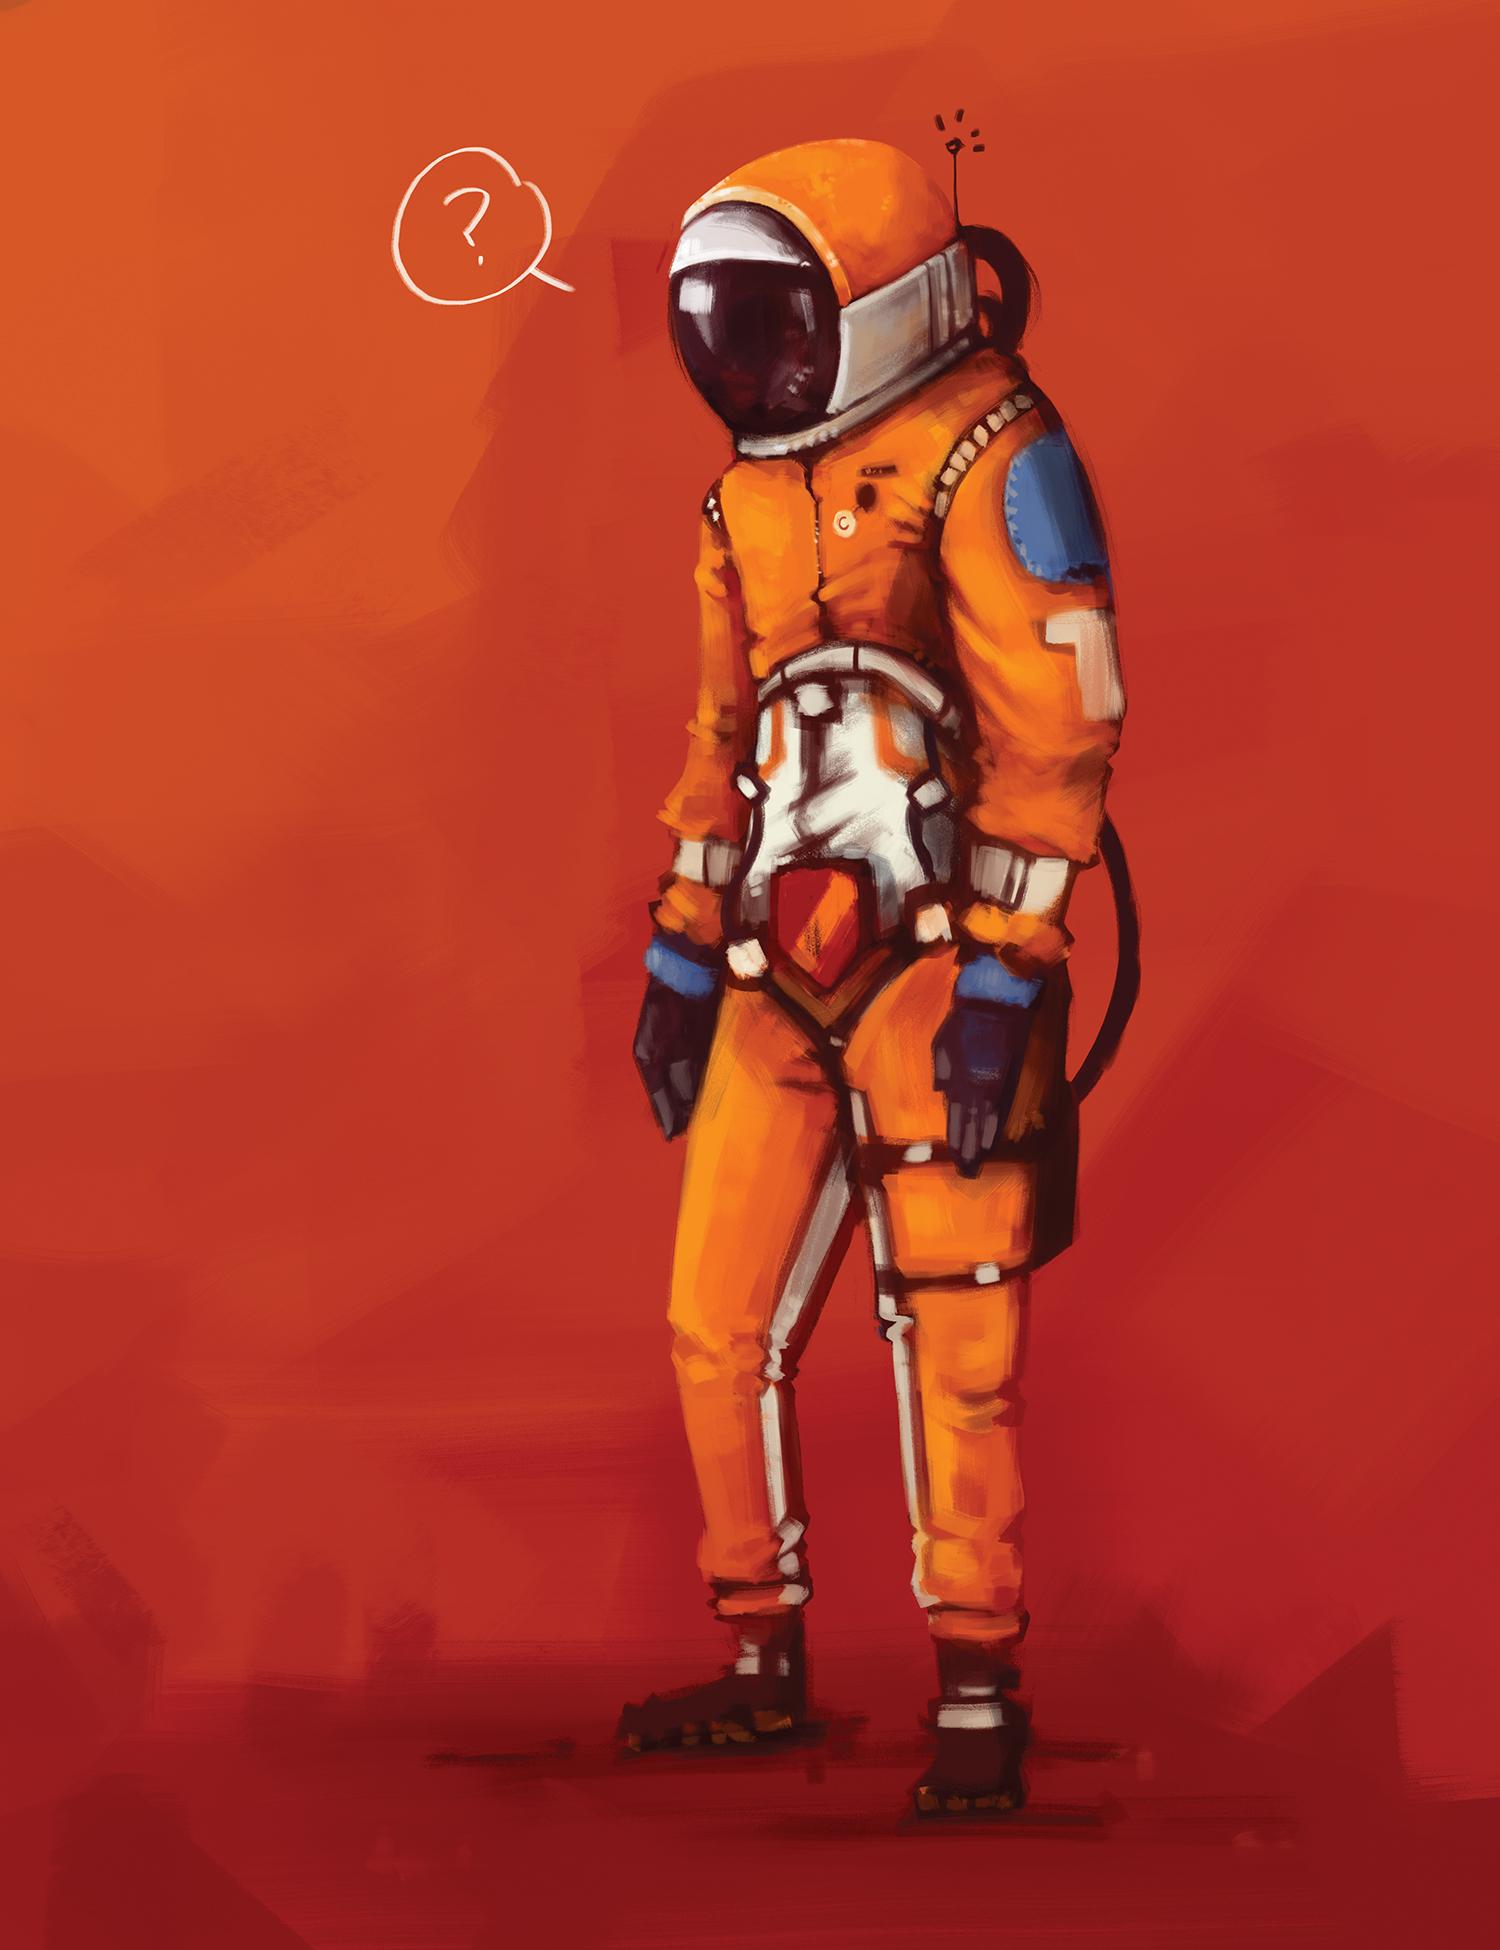 Astronaut-2018.jpg